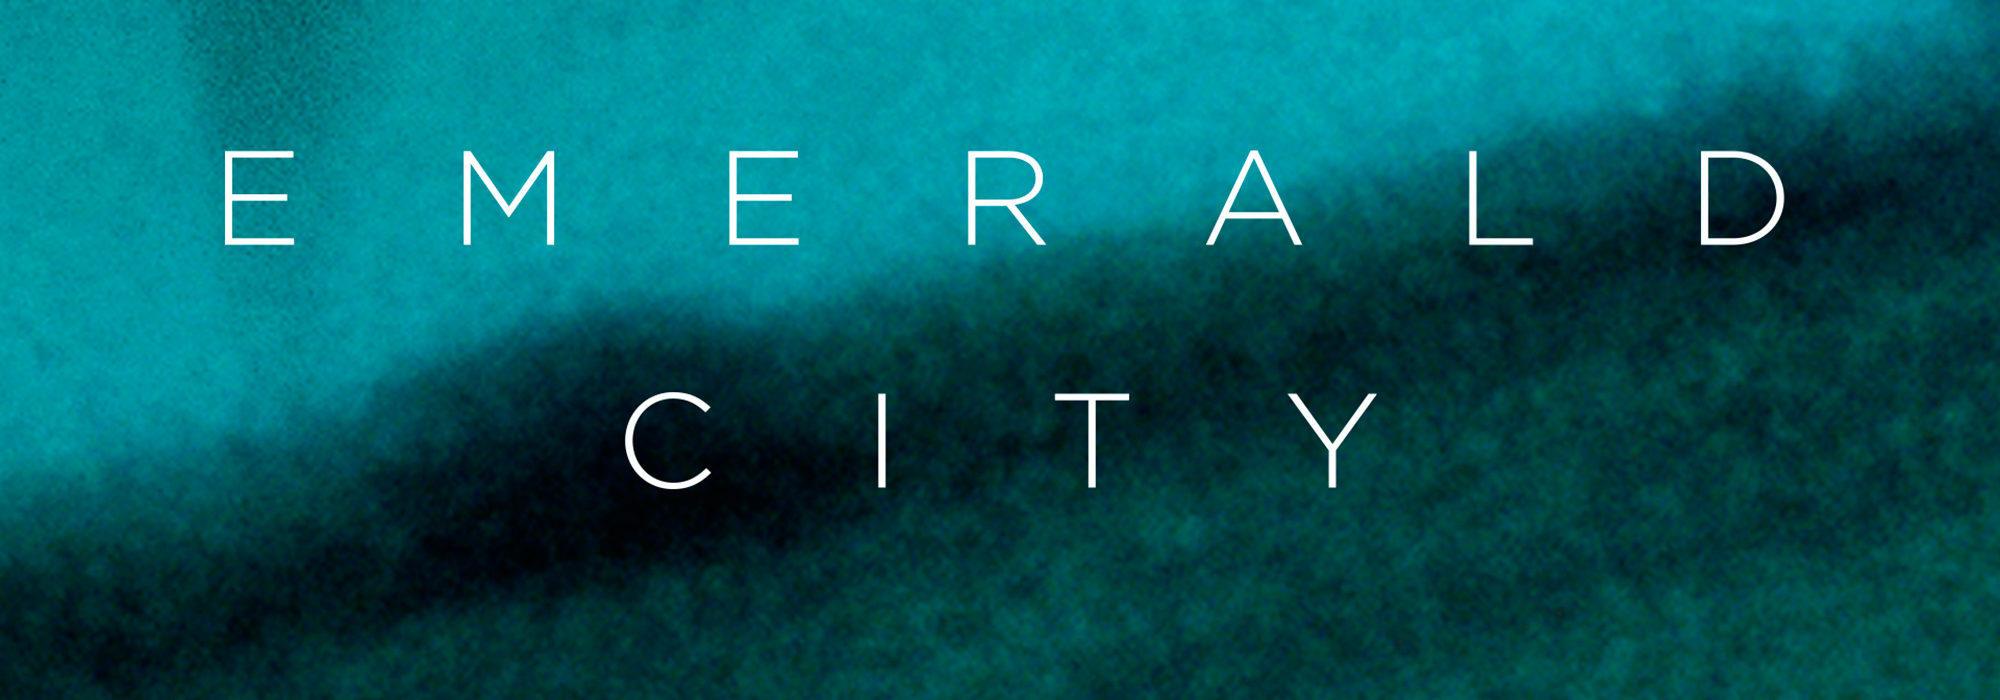 Emerald City, la nueva oferta de NBC a la que le falta una pizca de